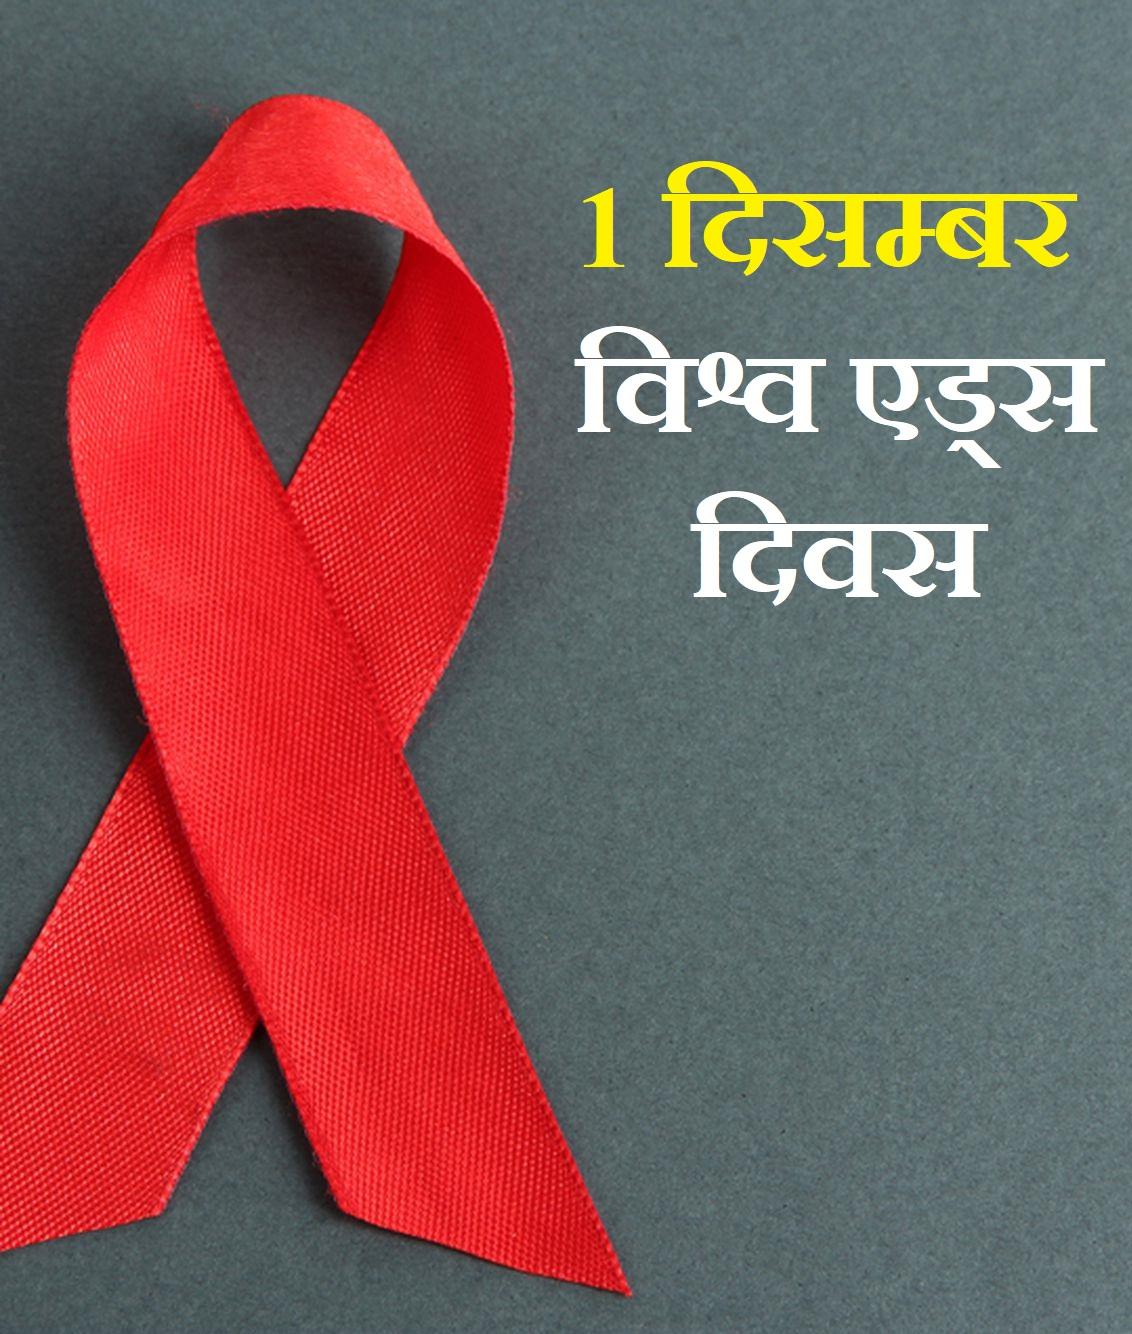 विश्व एड्स दिवस महत्त्व समाधान सावधानियाँ,Aids HIV Symptoms Causes Treatment In Hindi,aids se kaise bache,hiv se bachne ka tarika, 1 December